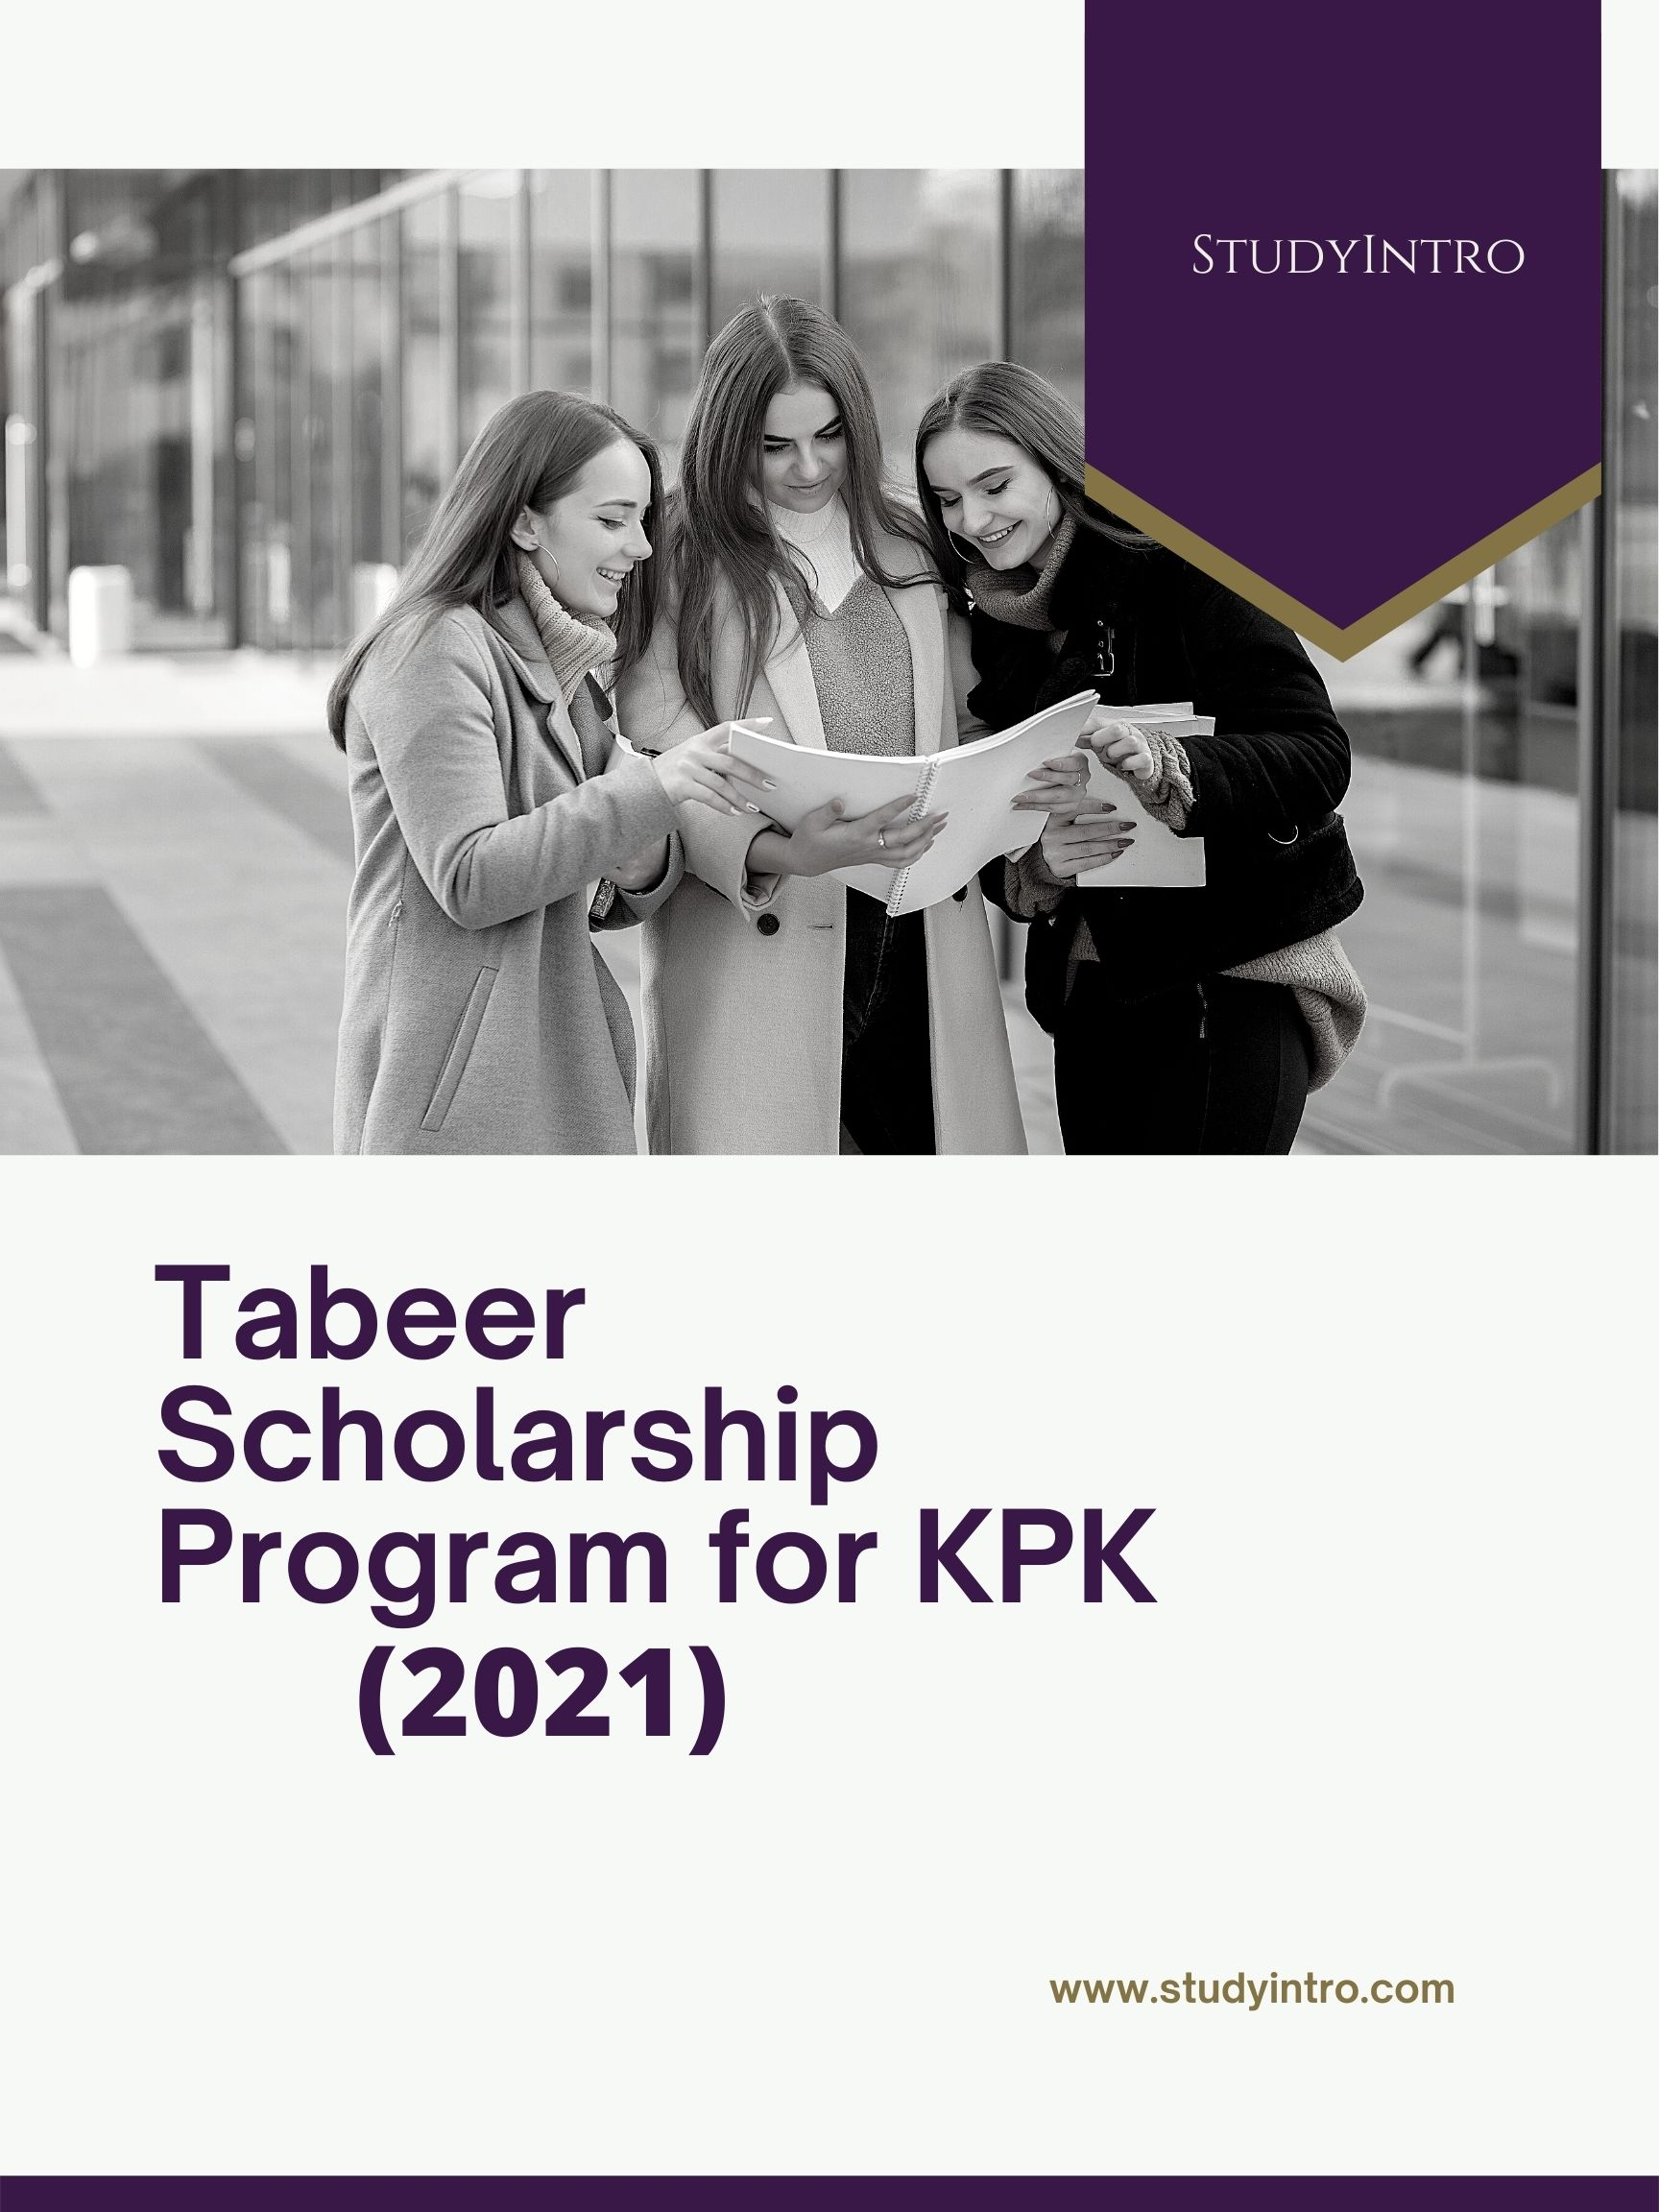 Tabeer Scholarships